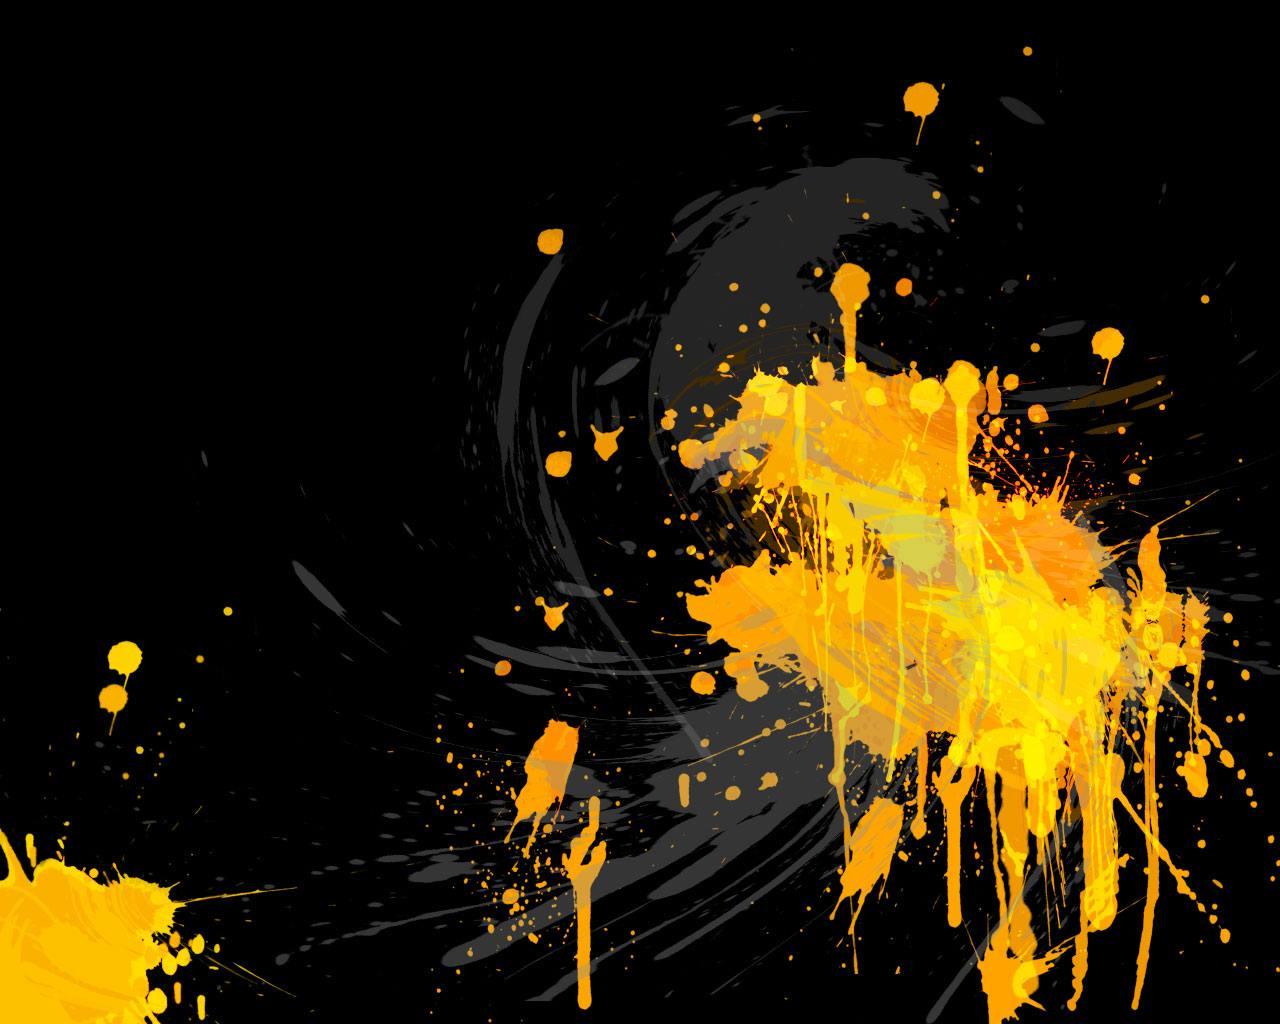 Free Splatter Wallpaper 32884 1600x1000 px